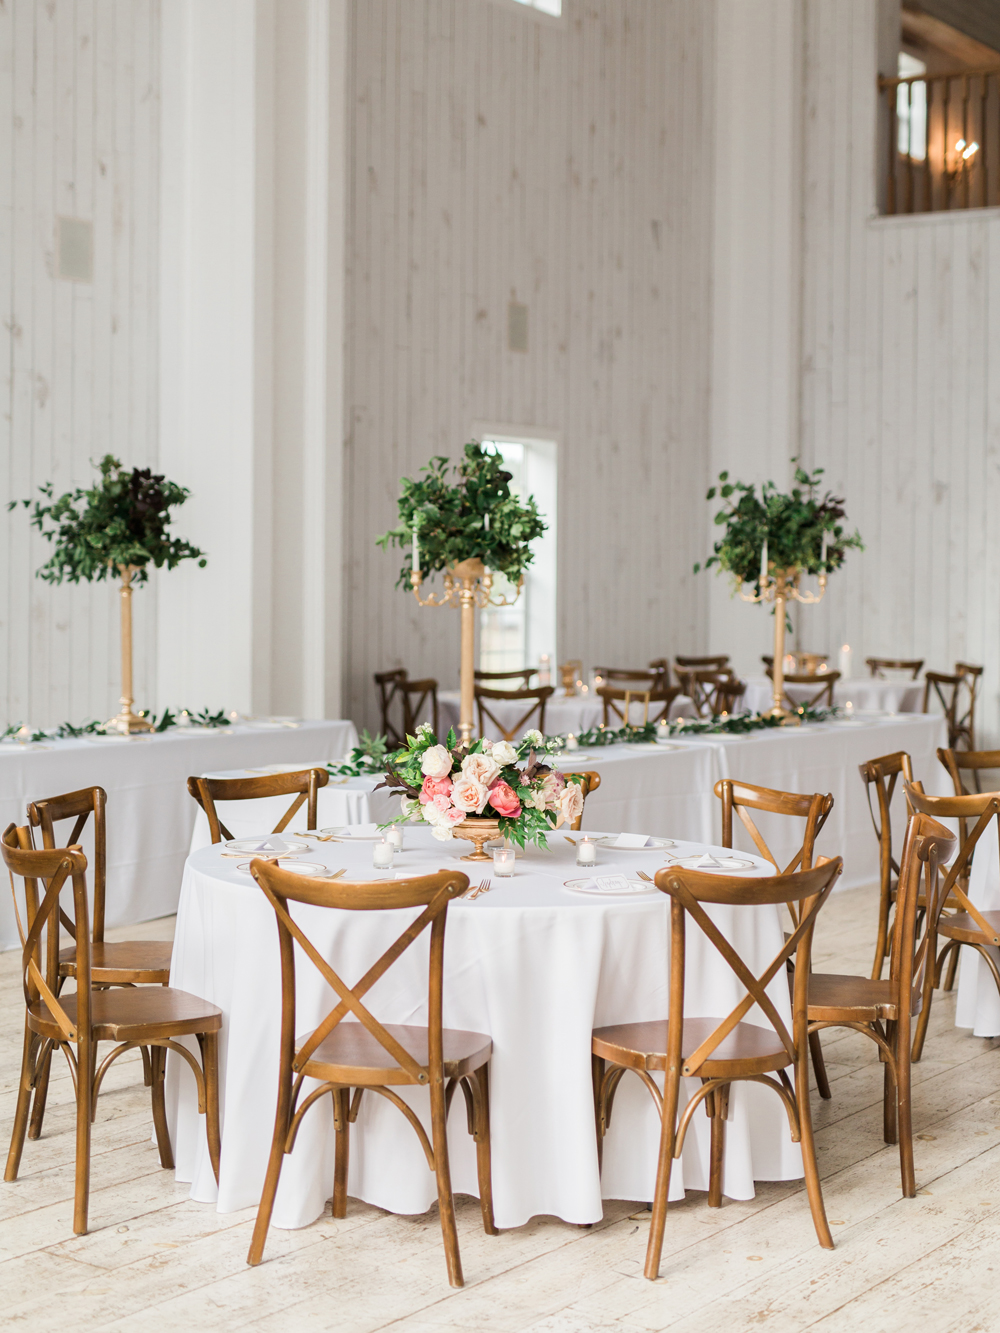 wedding receptions - photo by Elisabeth Carol Photography http://ruffledblog.com/picturesque-garden-wedding-at-white-sparrow-barn